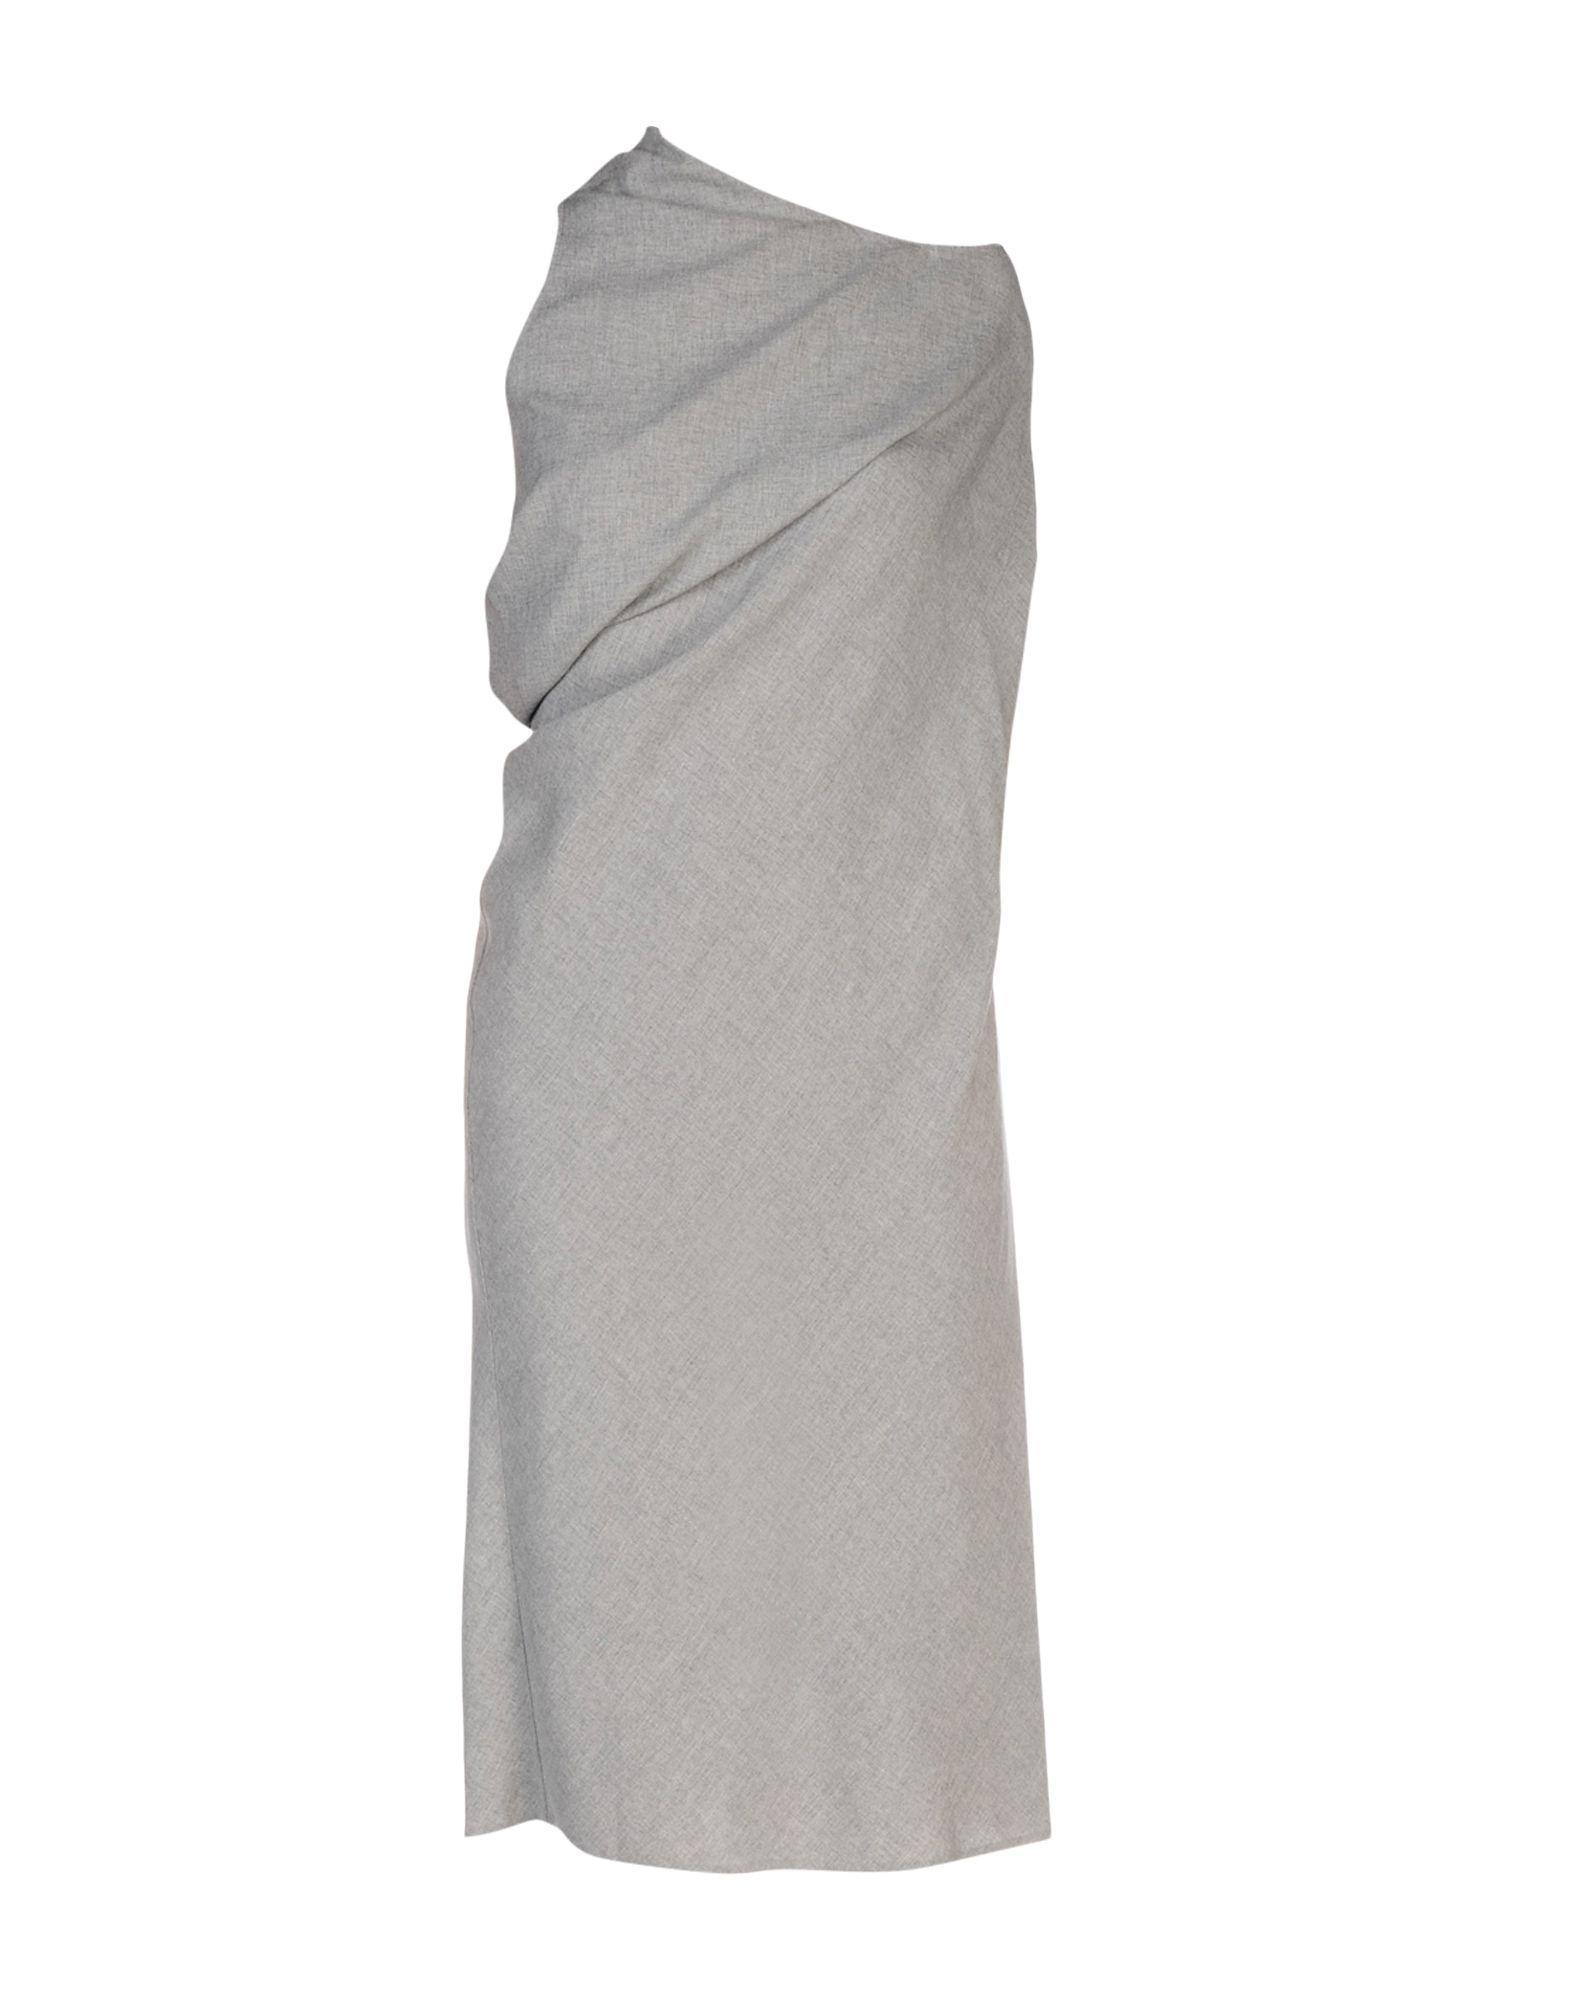 Mm6 Maison Margiela 3/4 Length Dresses In Grey